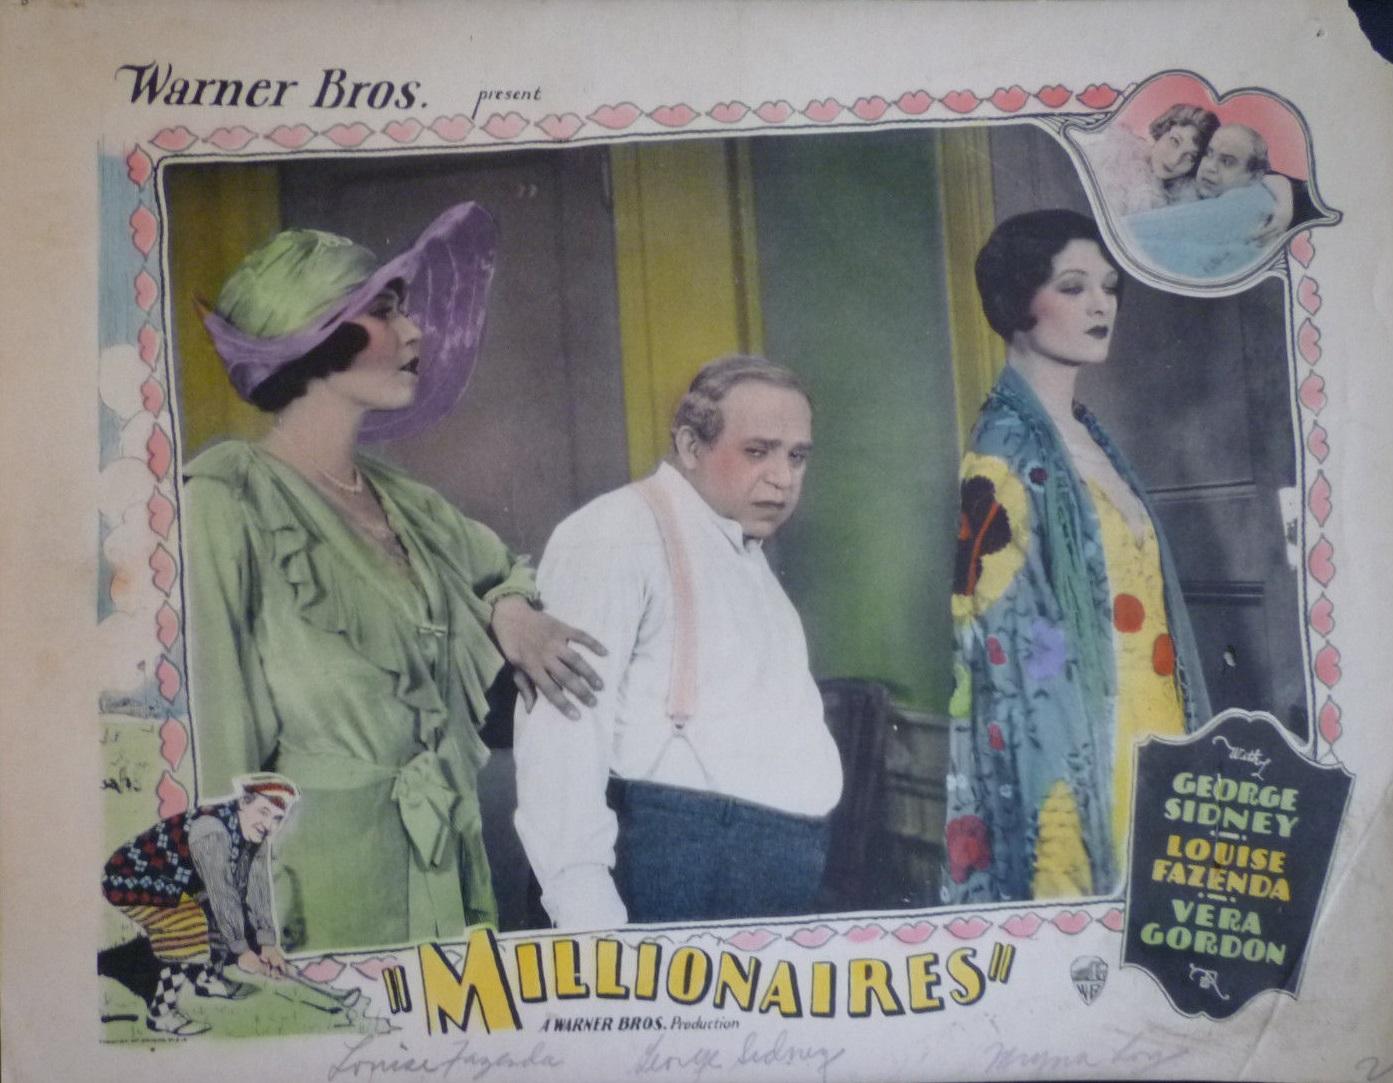 Louise Fazenda, Vera Gordon, and George Sidney in Millionaires (1926)